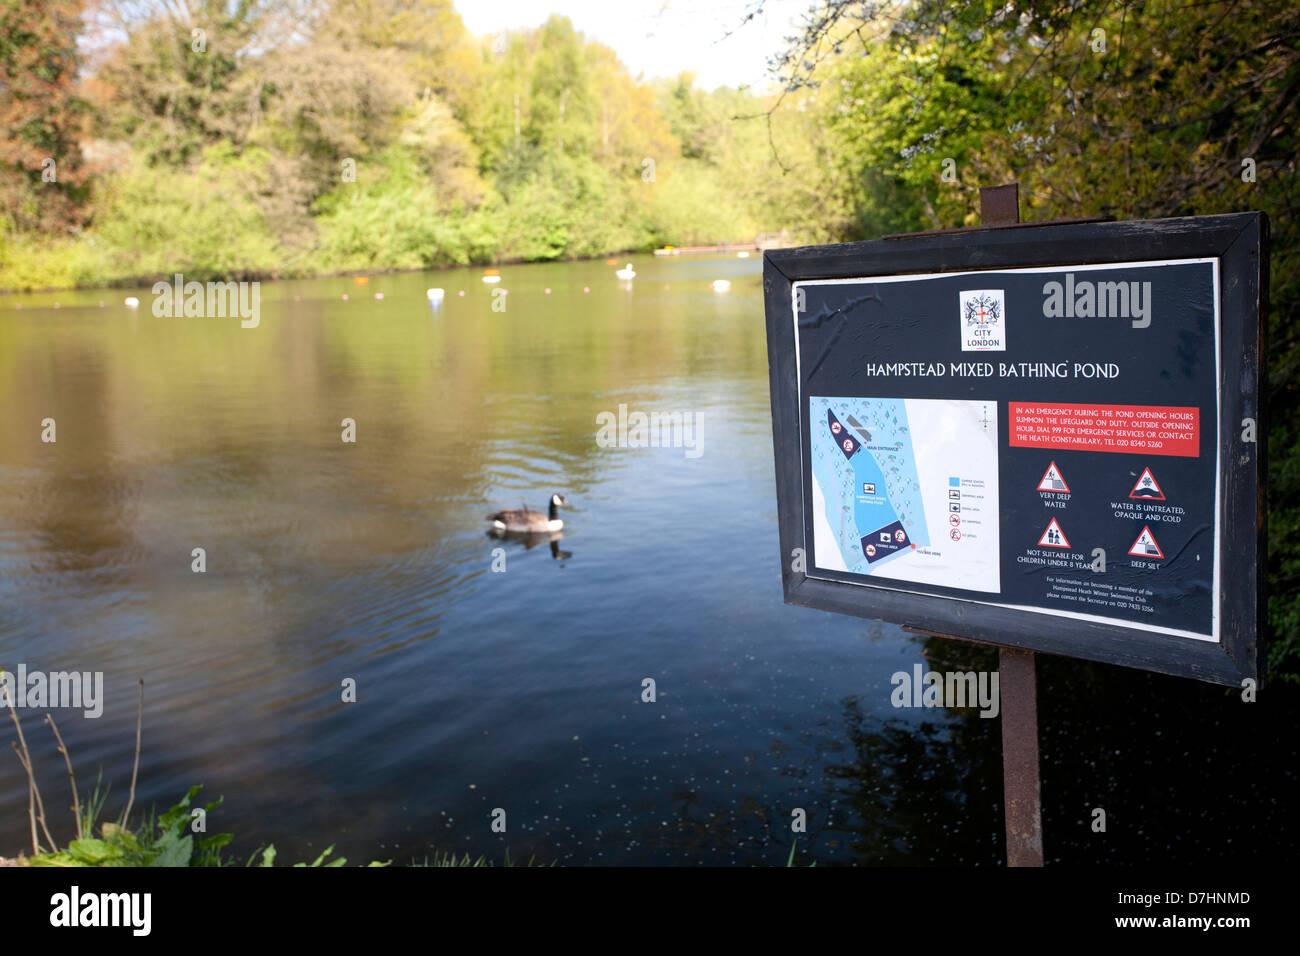 Hampstead Heath Mixed Bathing Pond, London - Stock Image